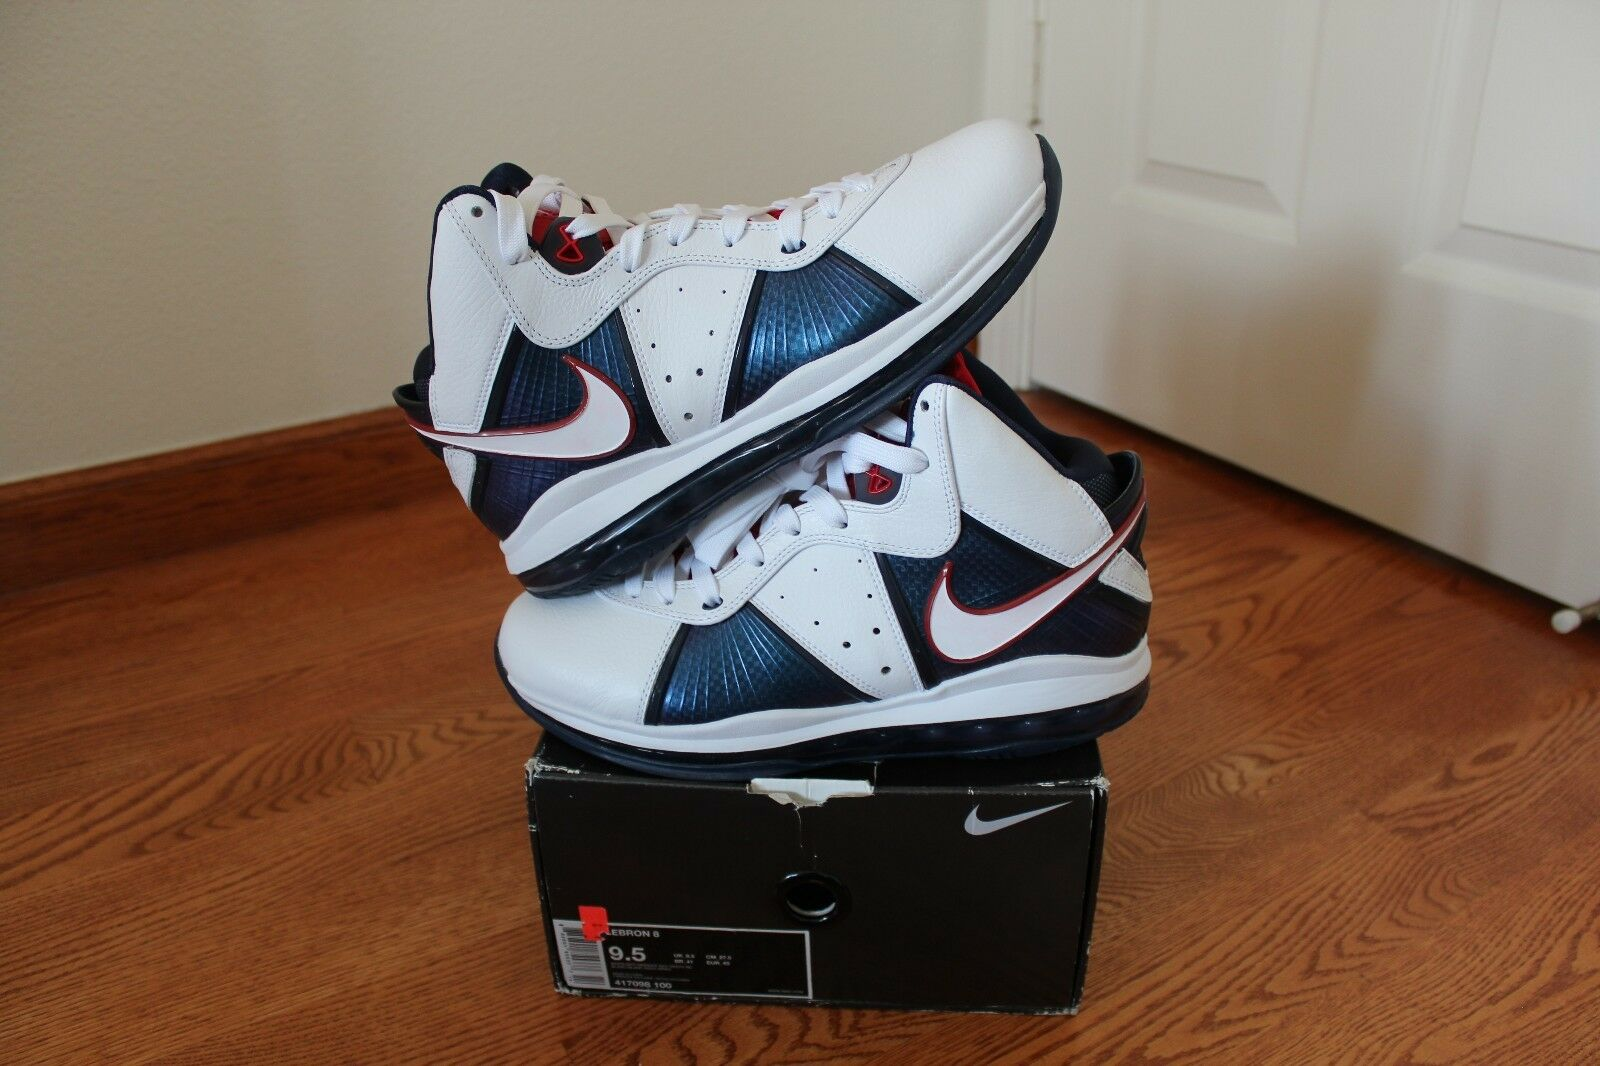 2010 FIBA Nike Air Max Lebron VIII 8 USA Olympic  Size 9.5